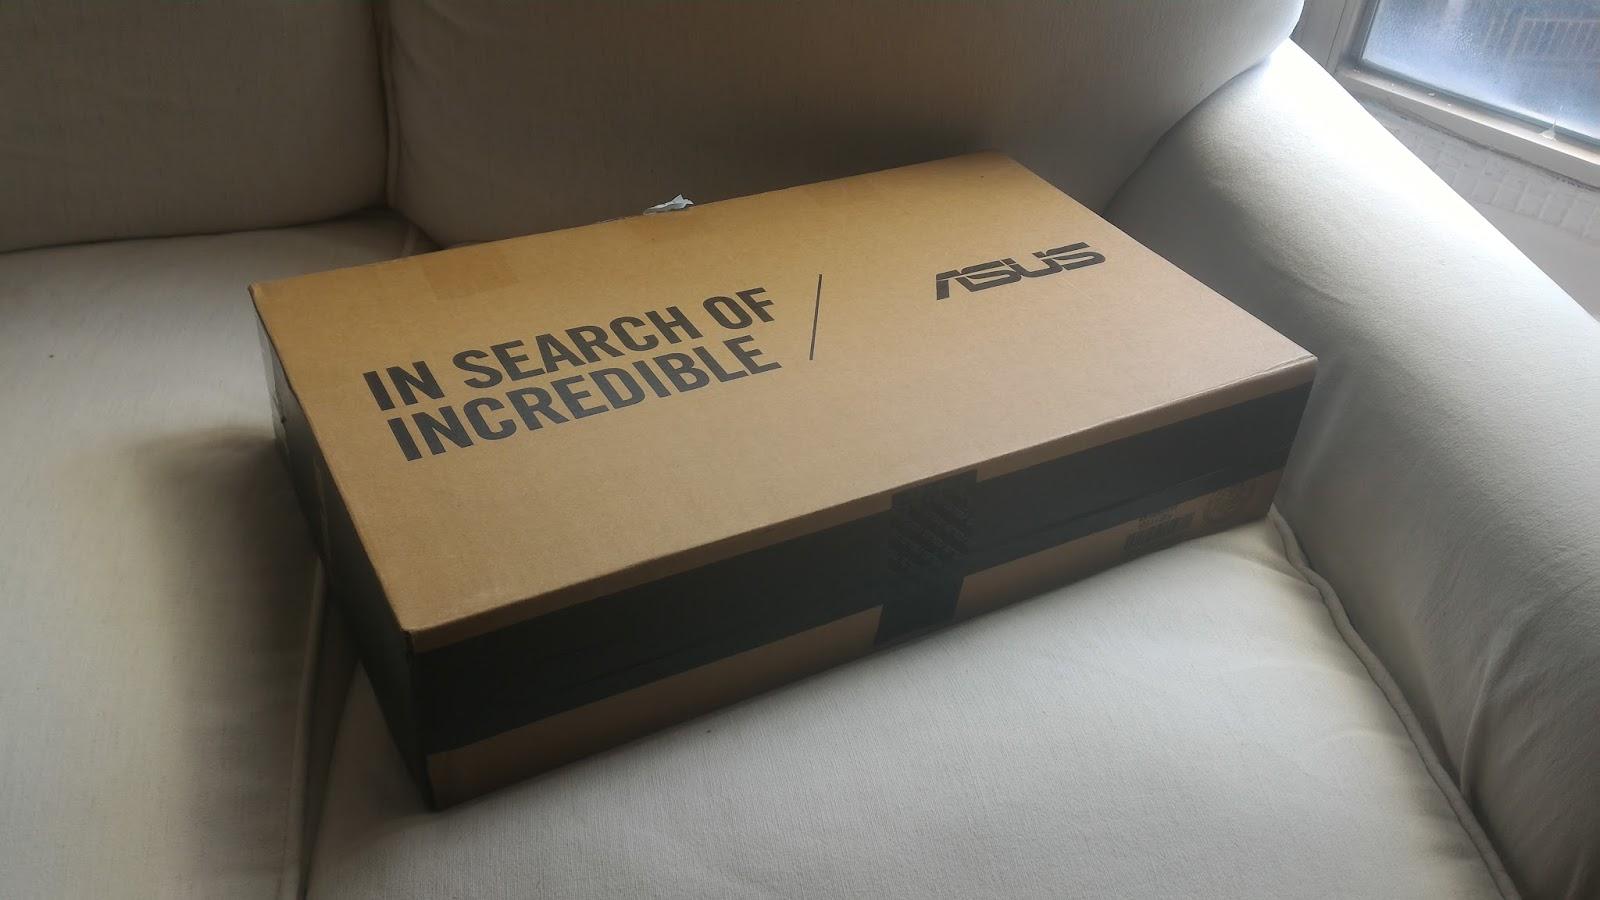 P 20160723 102623 SRES - [開箱] Asus K55VD i5-3230M 高效能 2G 獨顯筆電